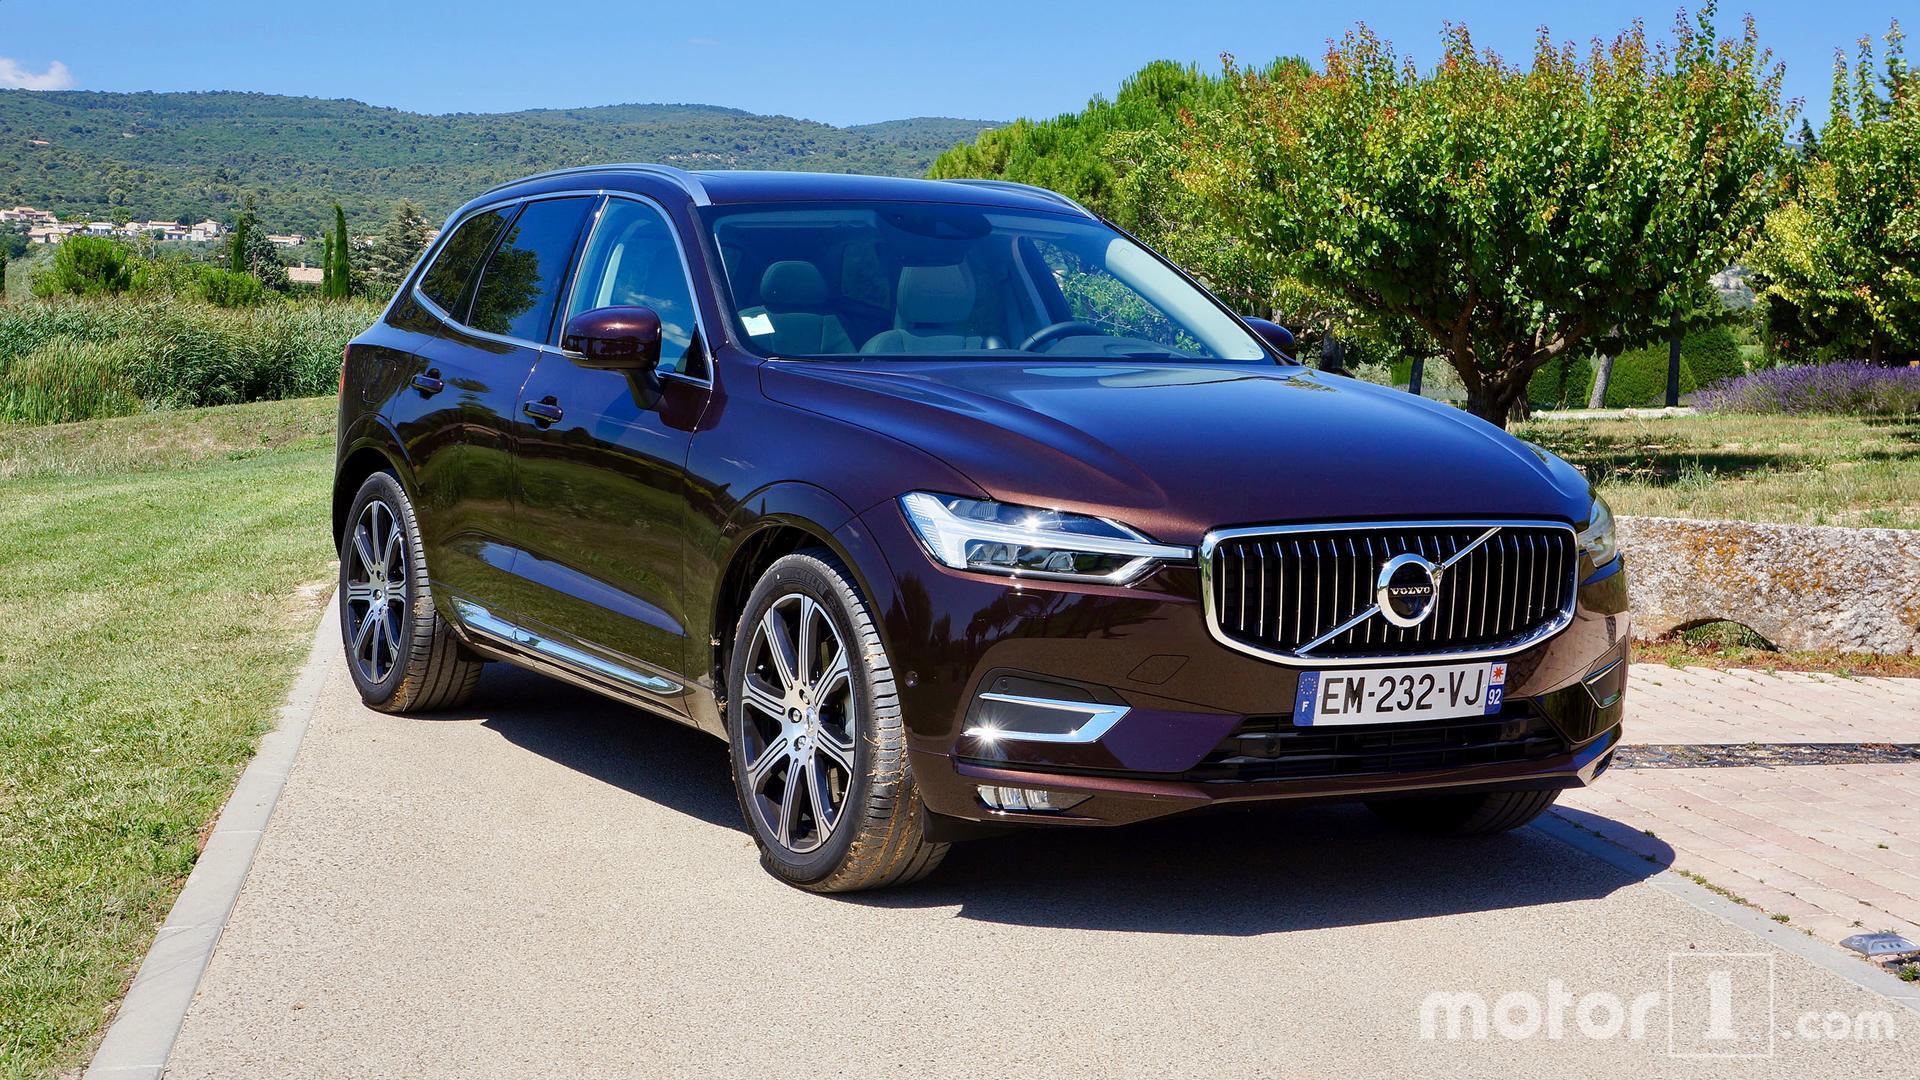 Essai Volvo Xc60 >> Essai Volvo Xc60 2017 Le Charme Scandinave